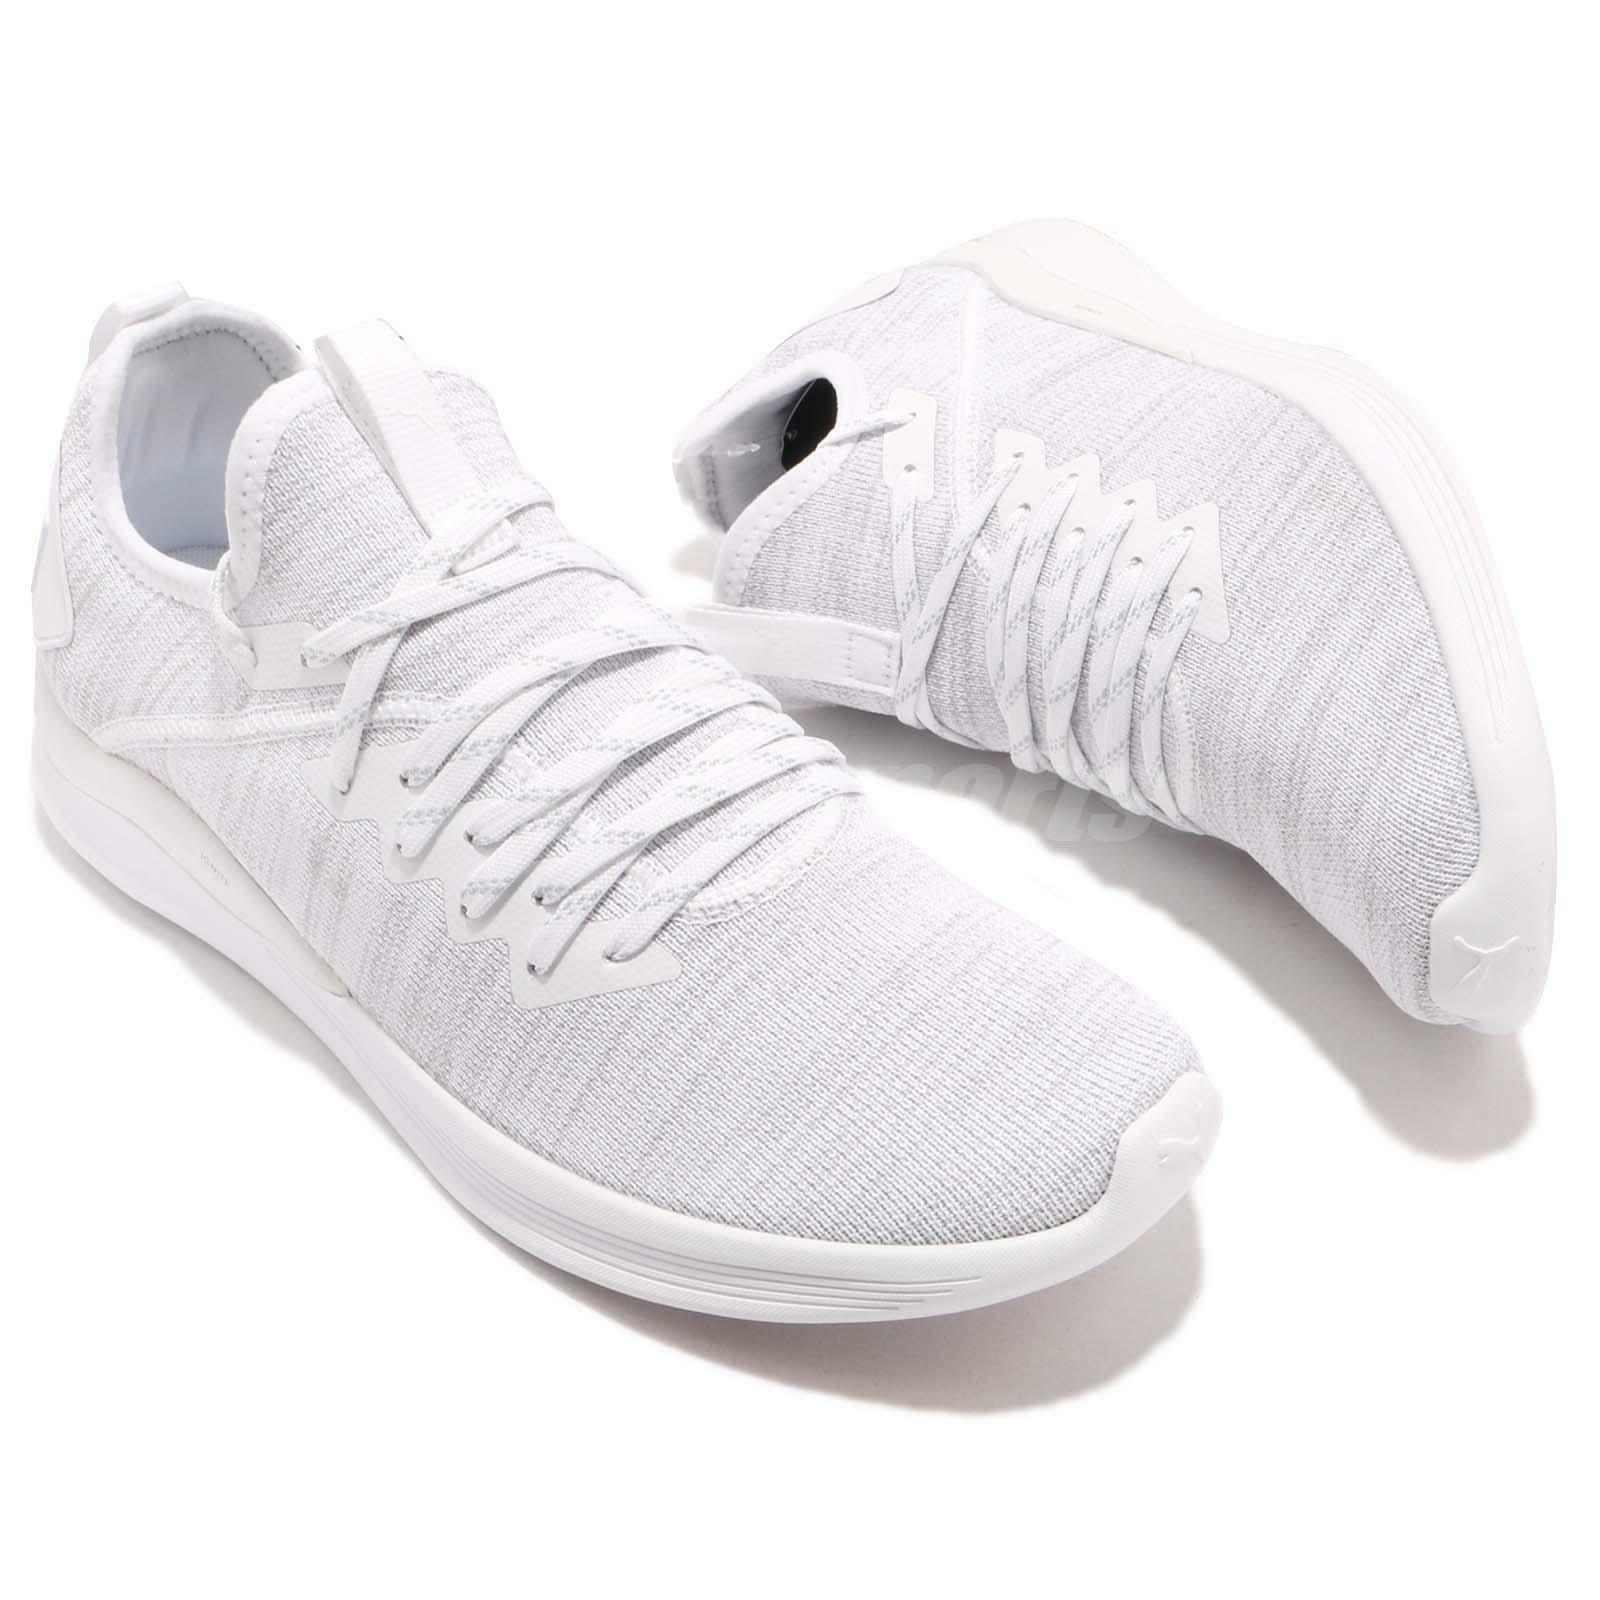 PUMA IGNITE FLASH EvoKnit White Grey 9.5 Cross Training Shoes Trainers 190508-03